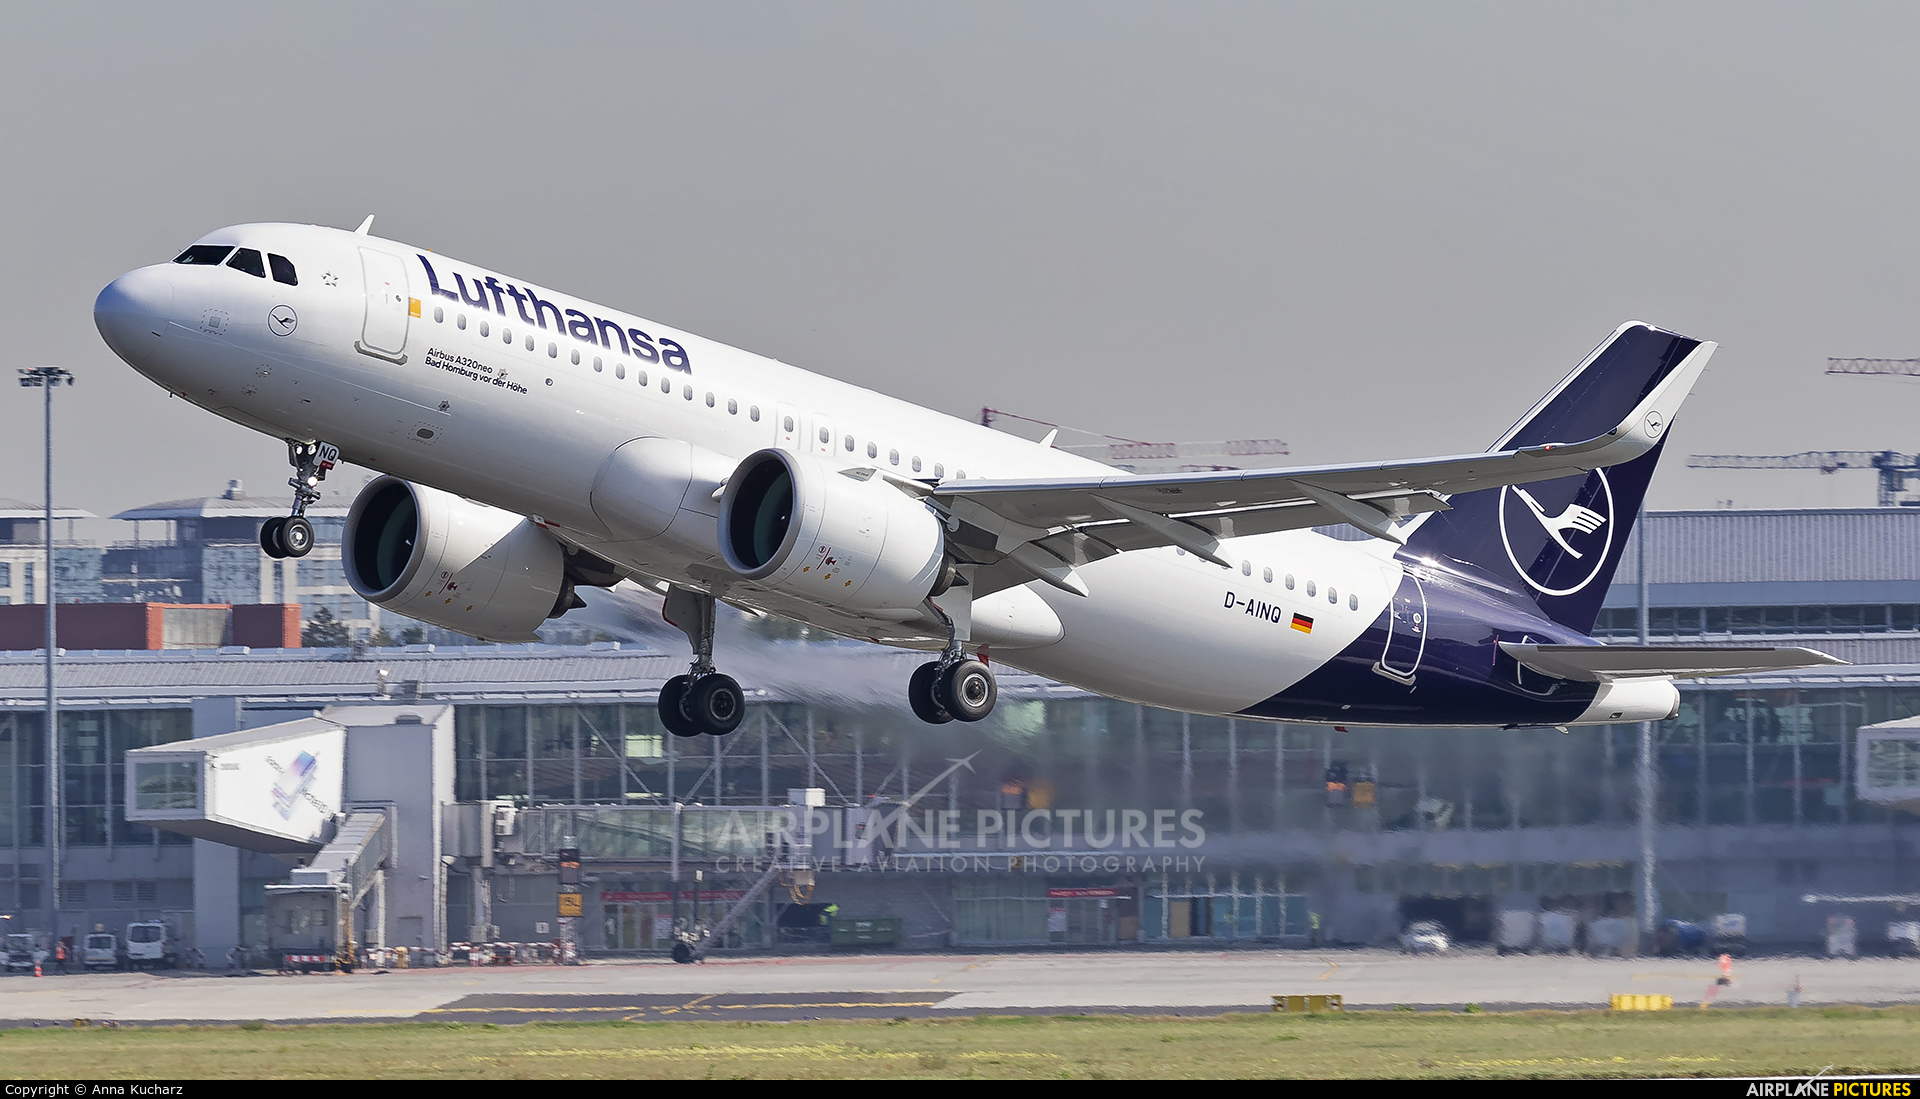 Lufthansa D-AINQ aircraft at Warsaw - Frederic Chopin